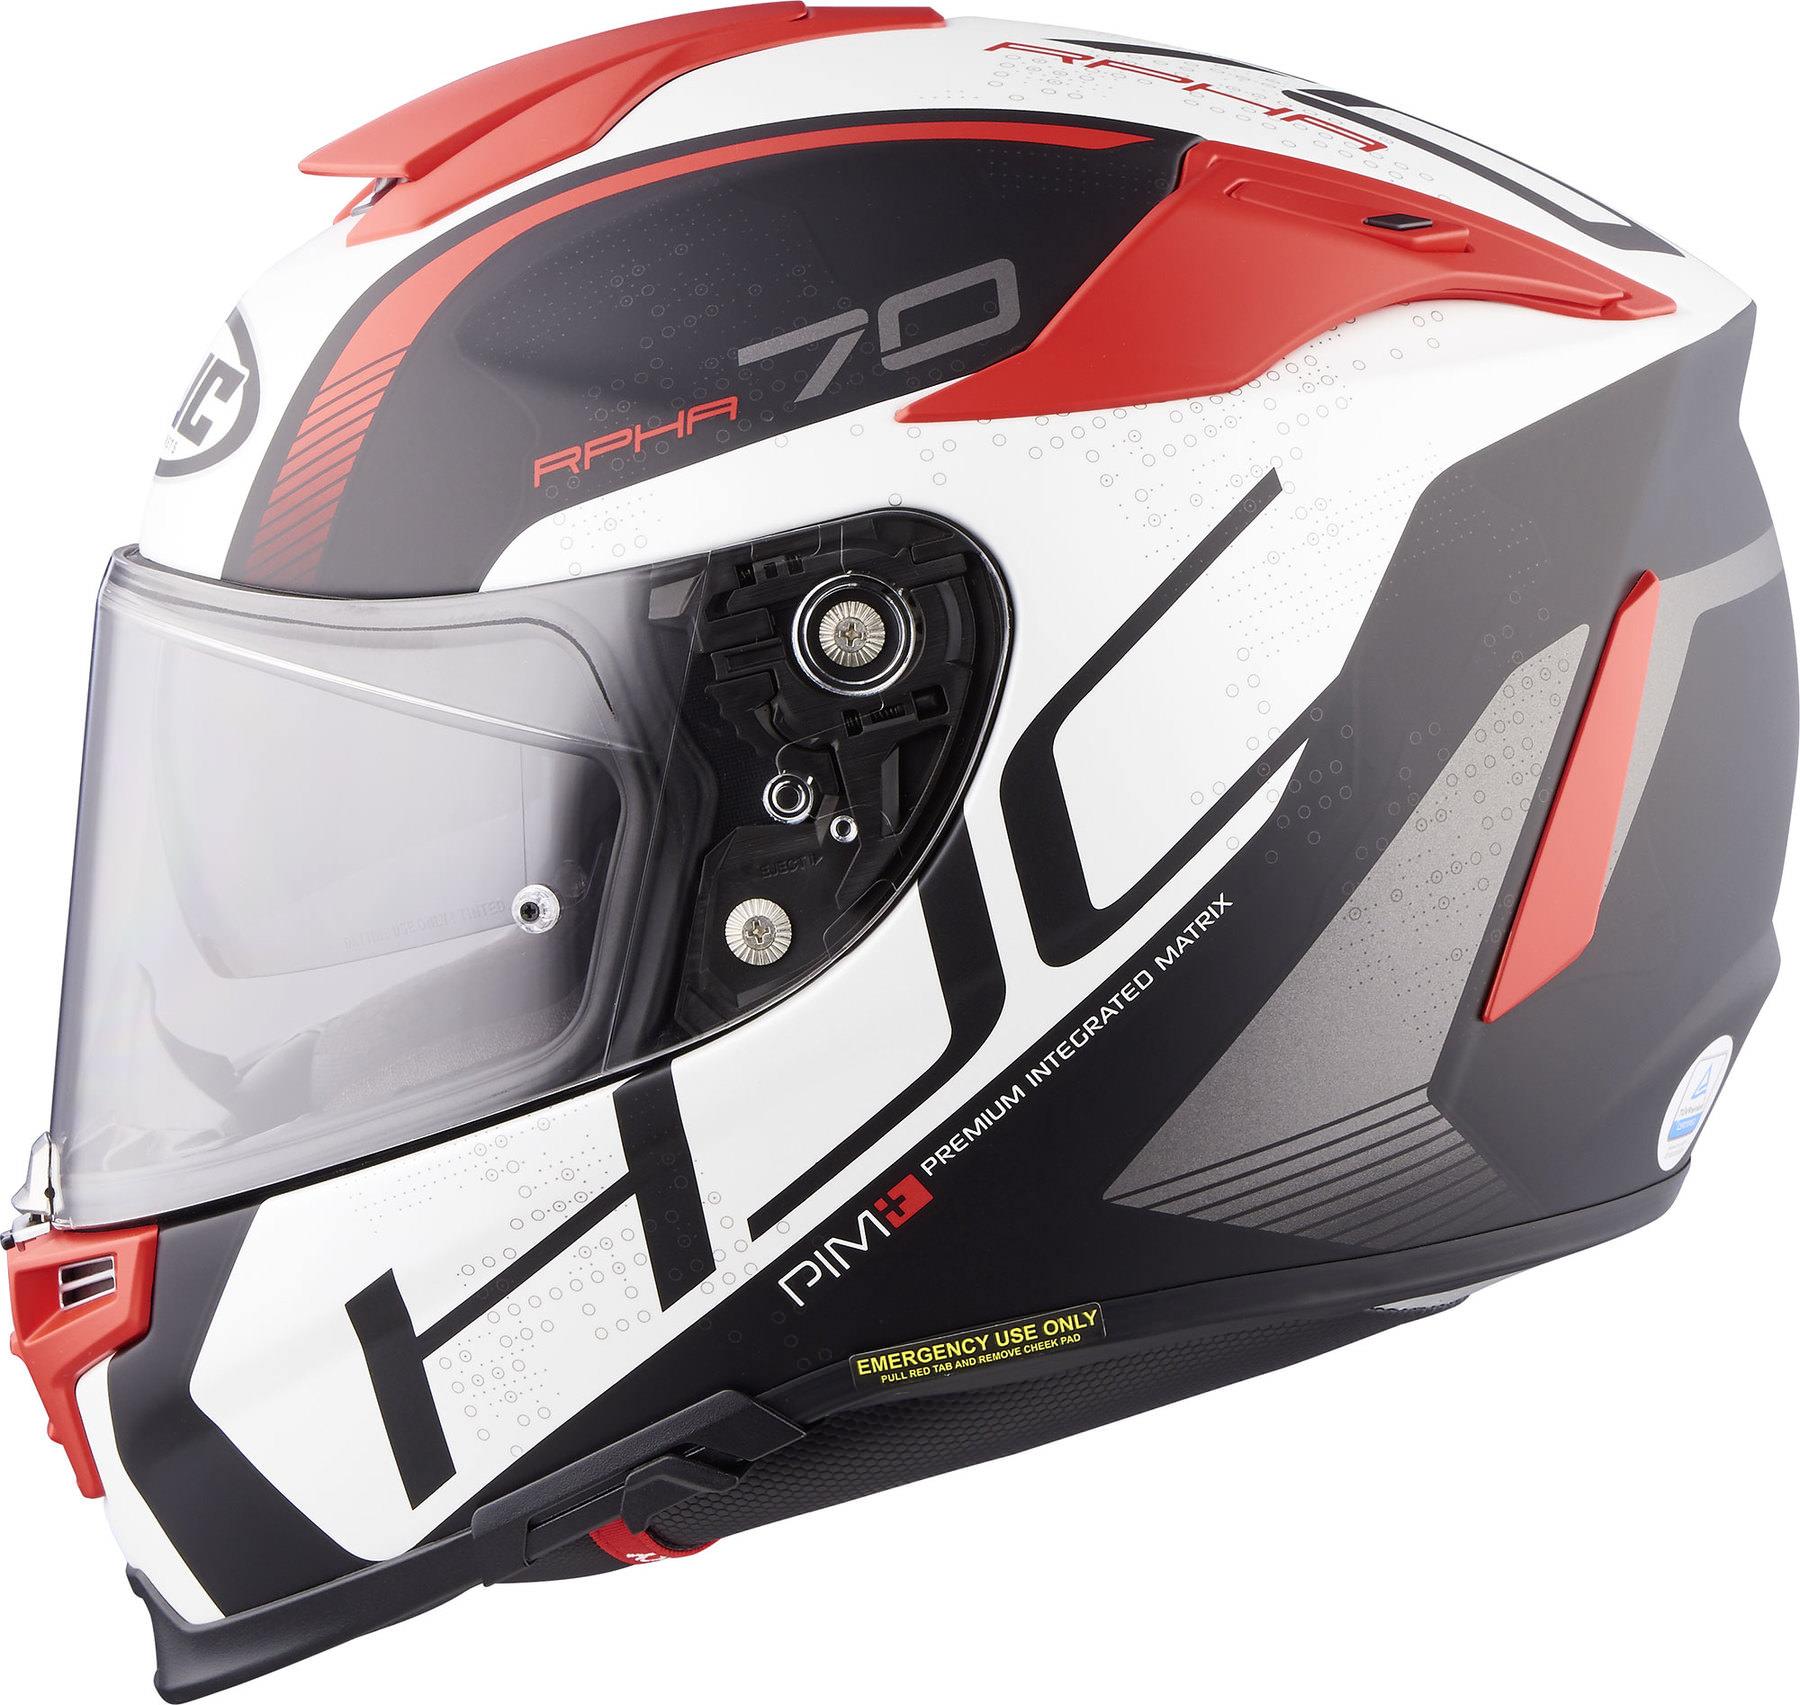 HJC Head Cushion for Motorcycle Helmet Rpha 70